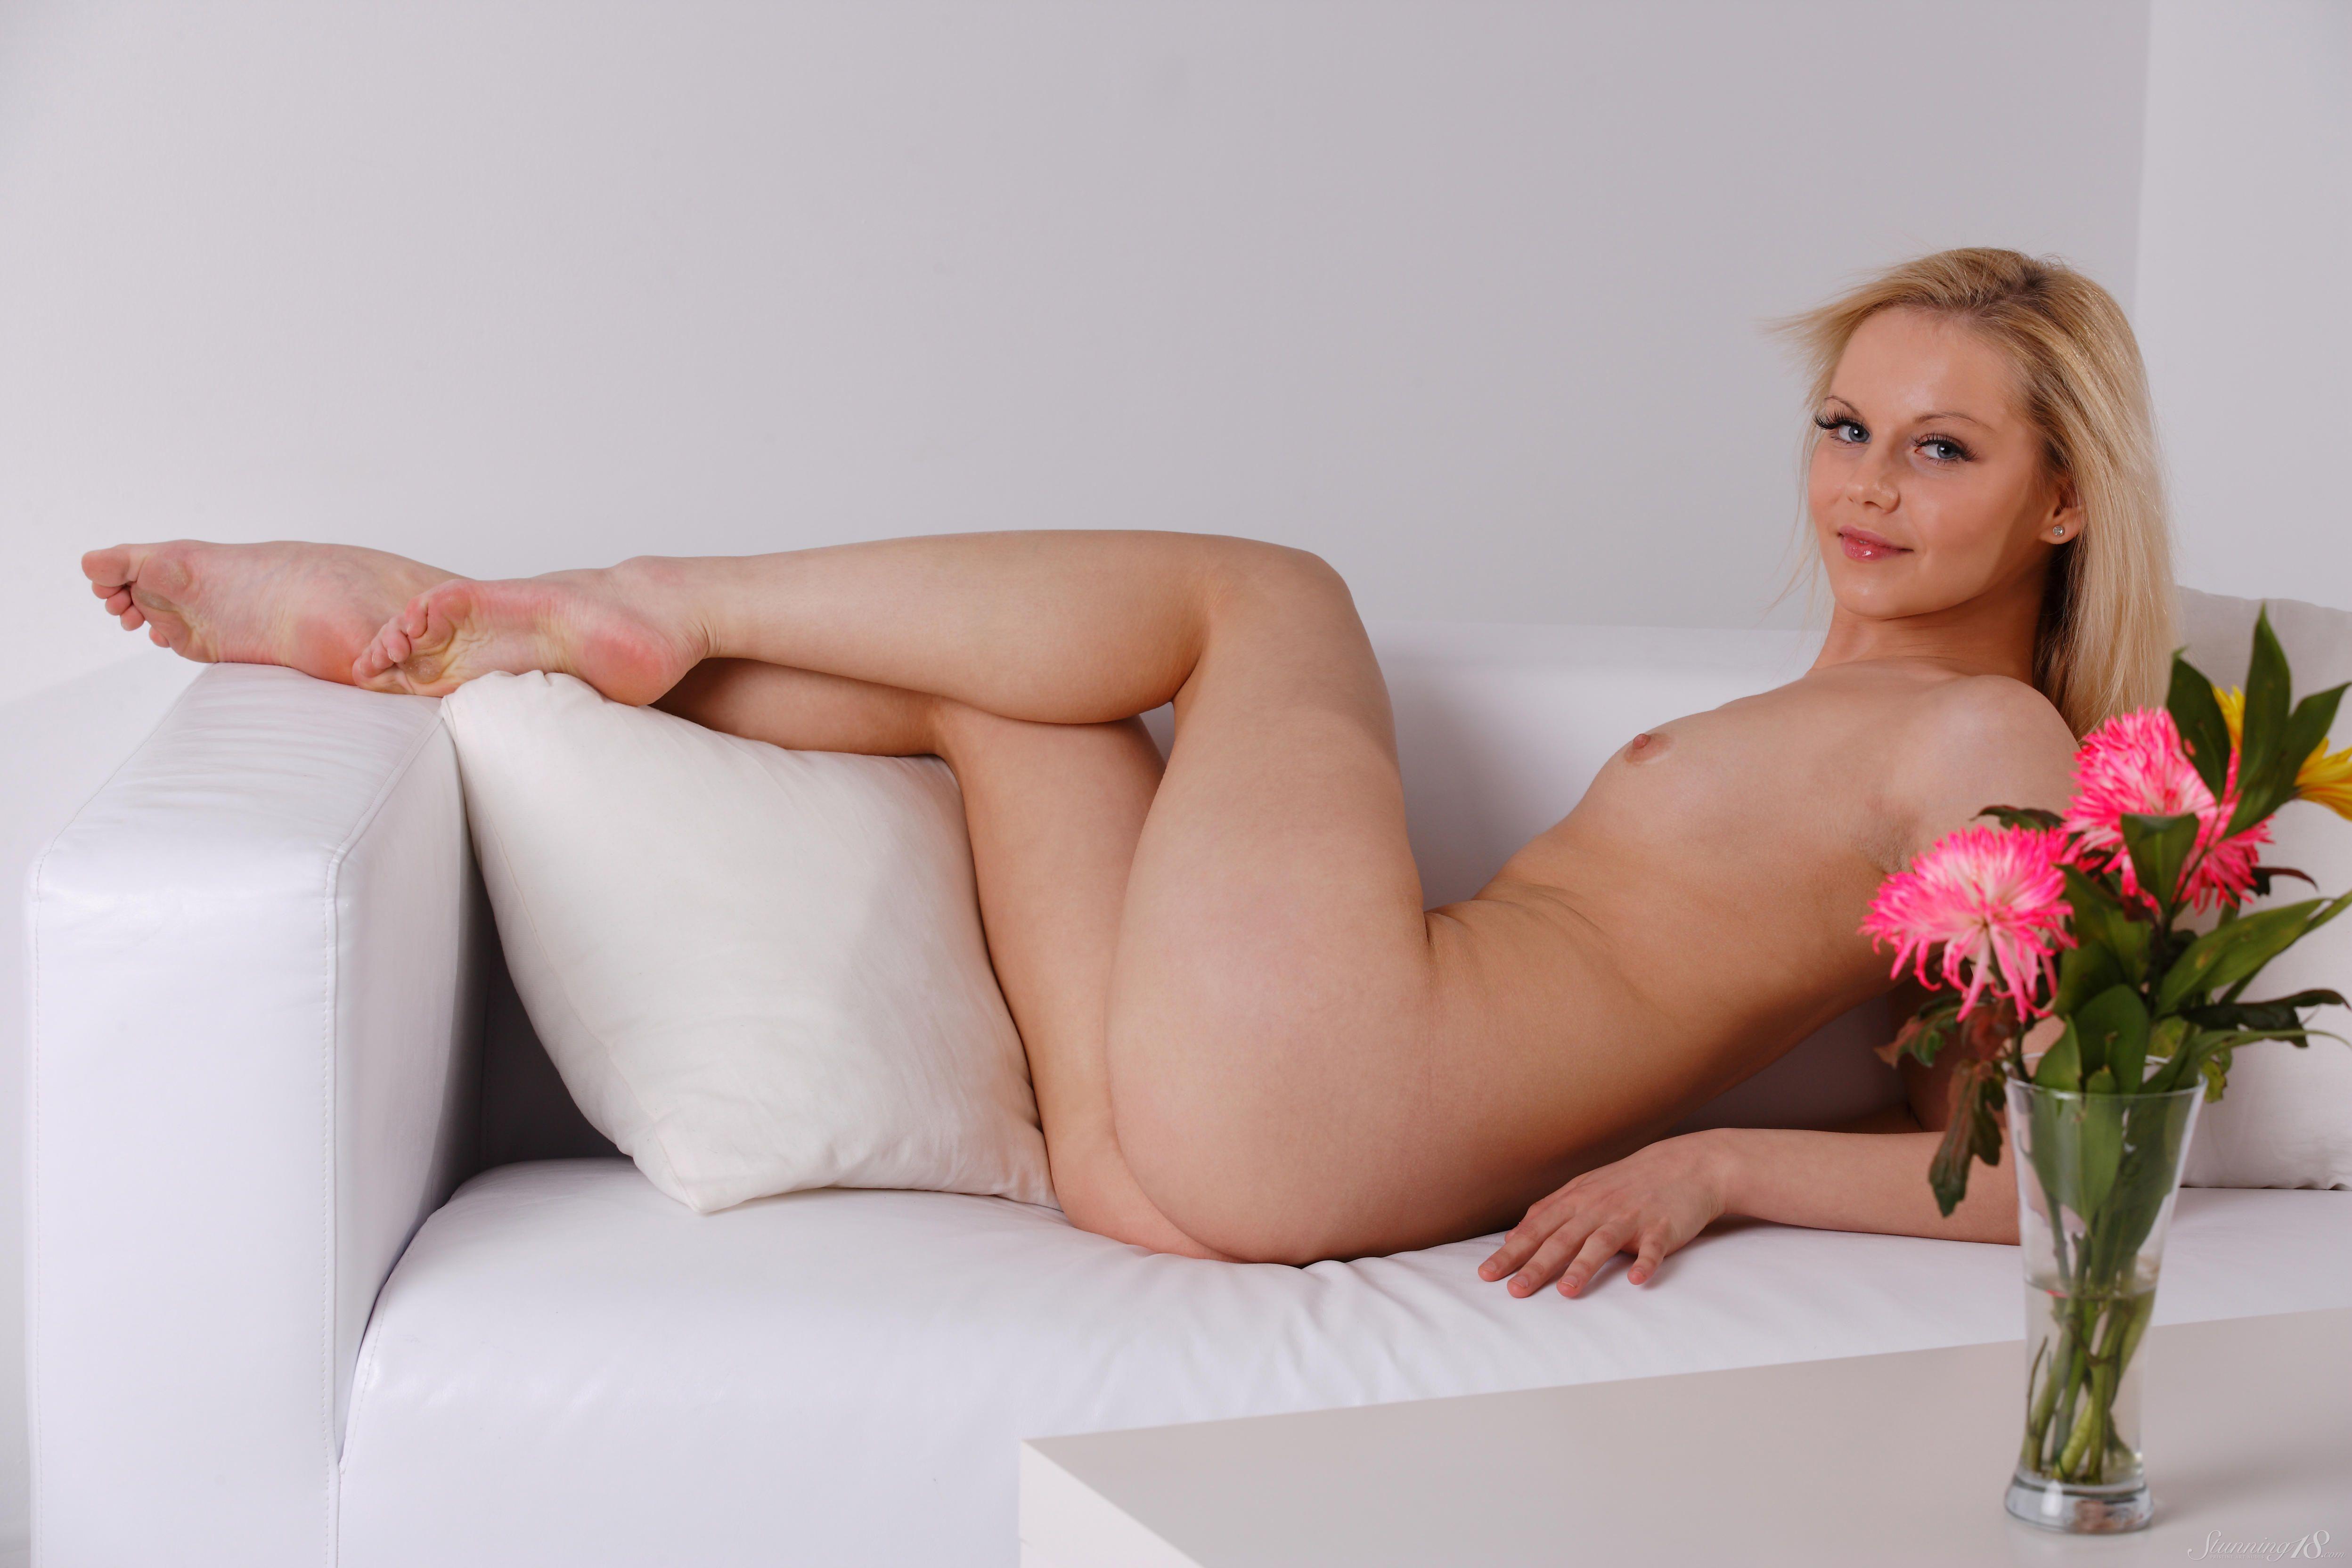 http://i6.imageban.ru/out/2013/08/25/73c51c442cf317d11b720cea654a1a01.jpg